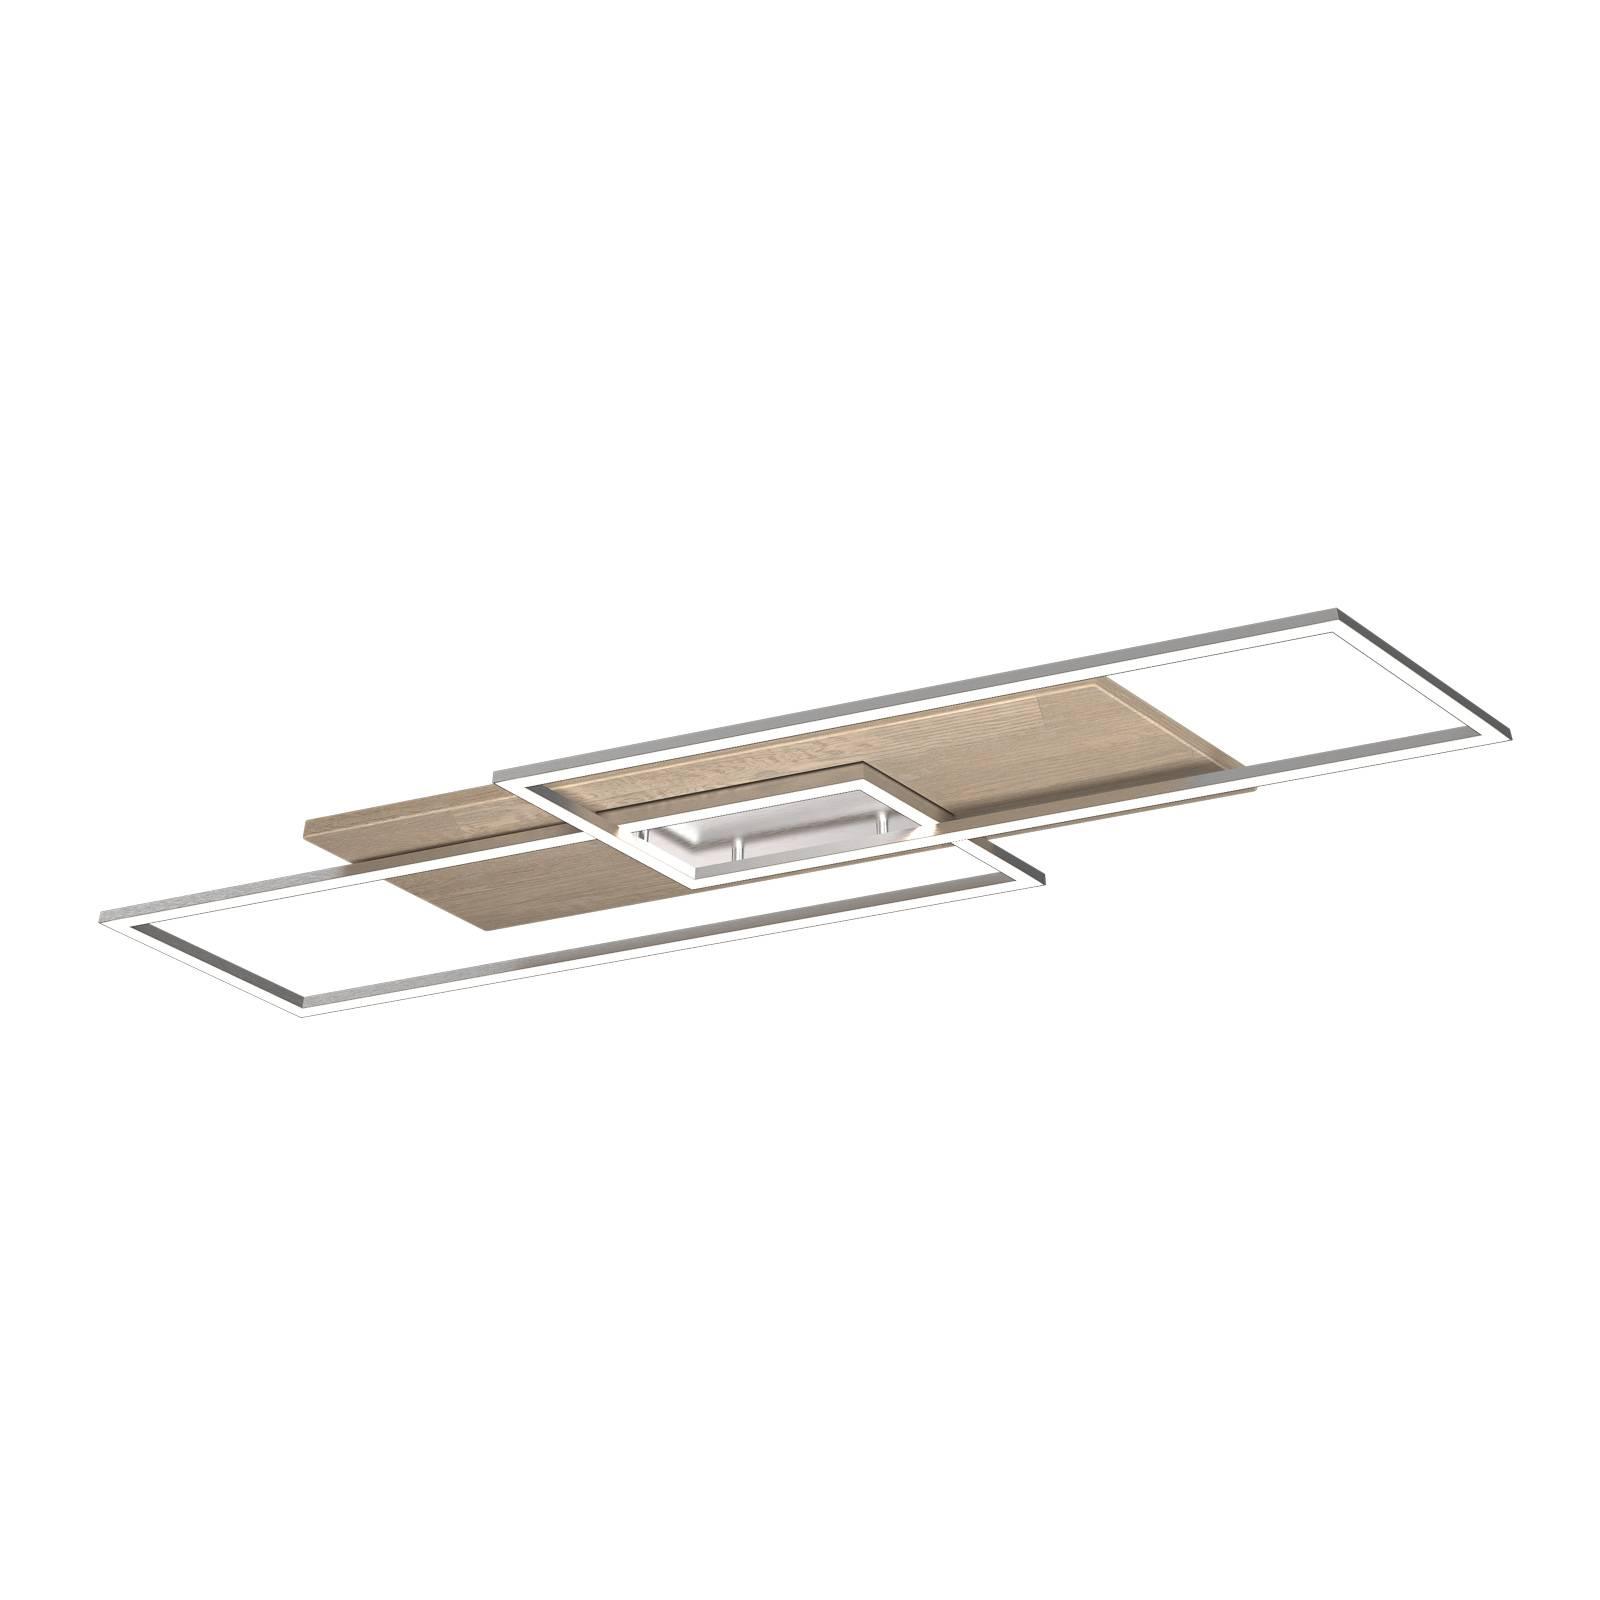 LED-kattovalaisin Panama XL, kalkittu tammi